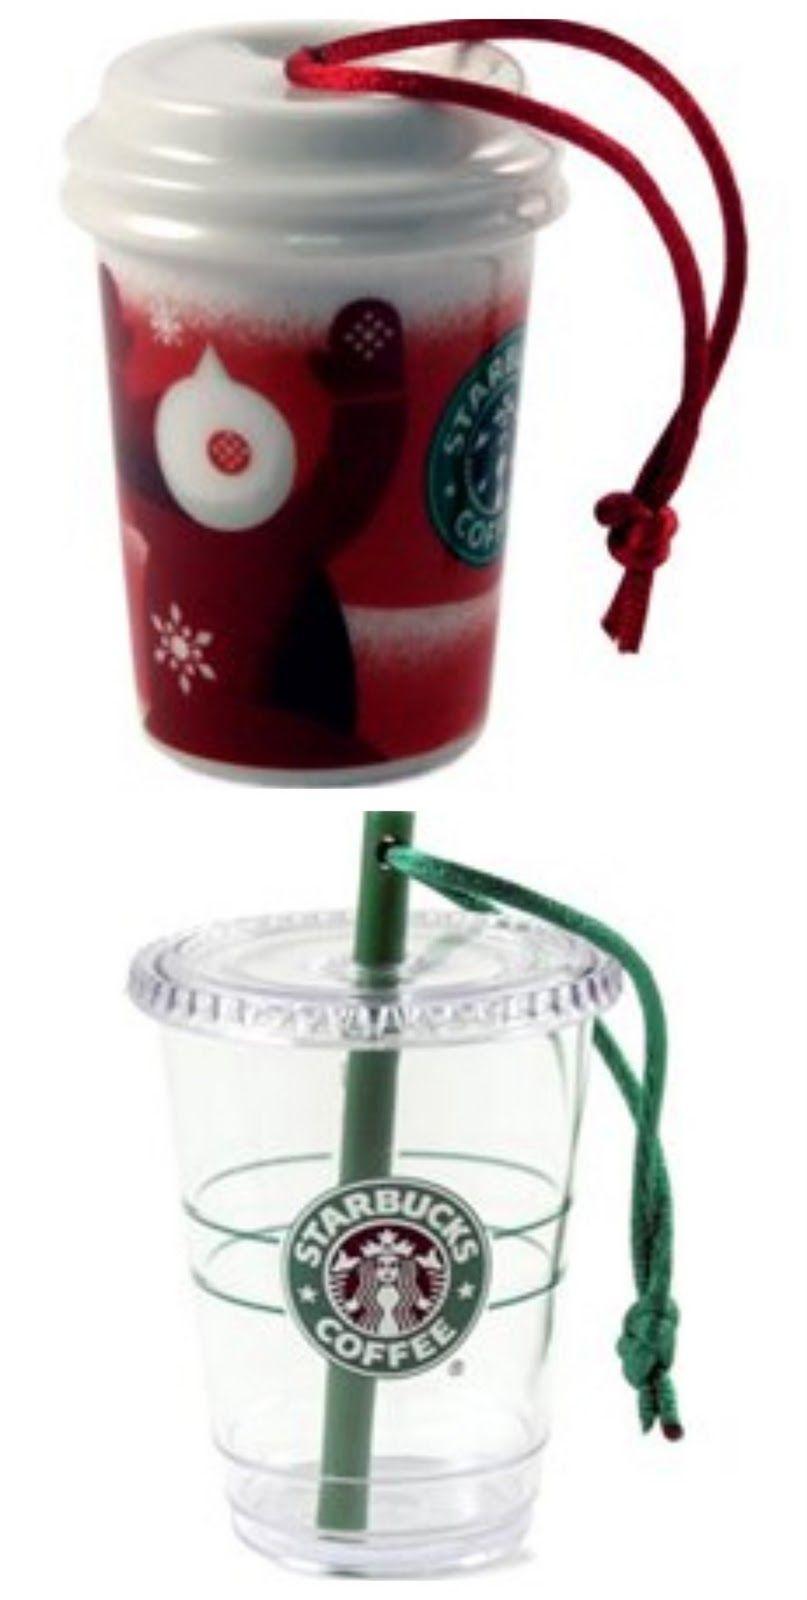 Starbucks ornaments | FUN THINGS | Pinterest | Starbucks, Ornament ...